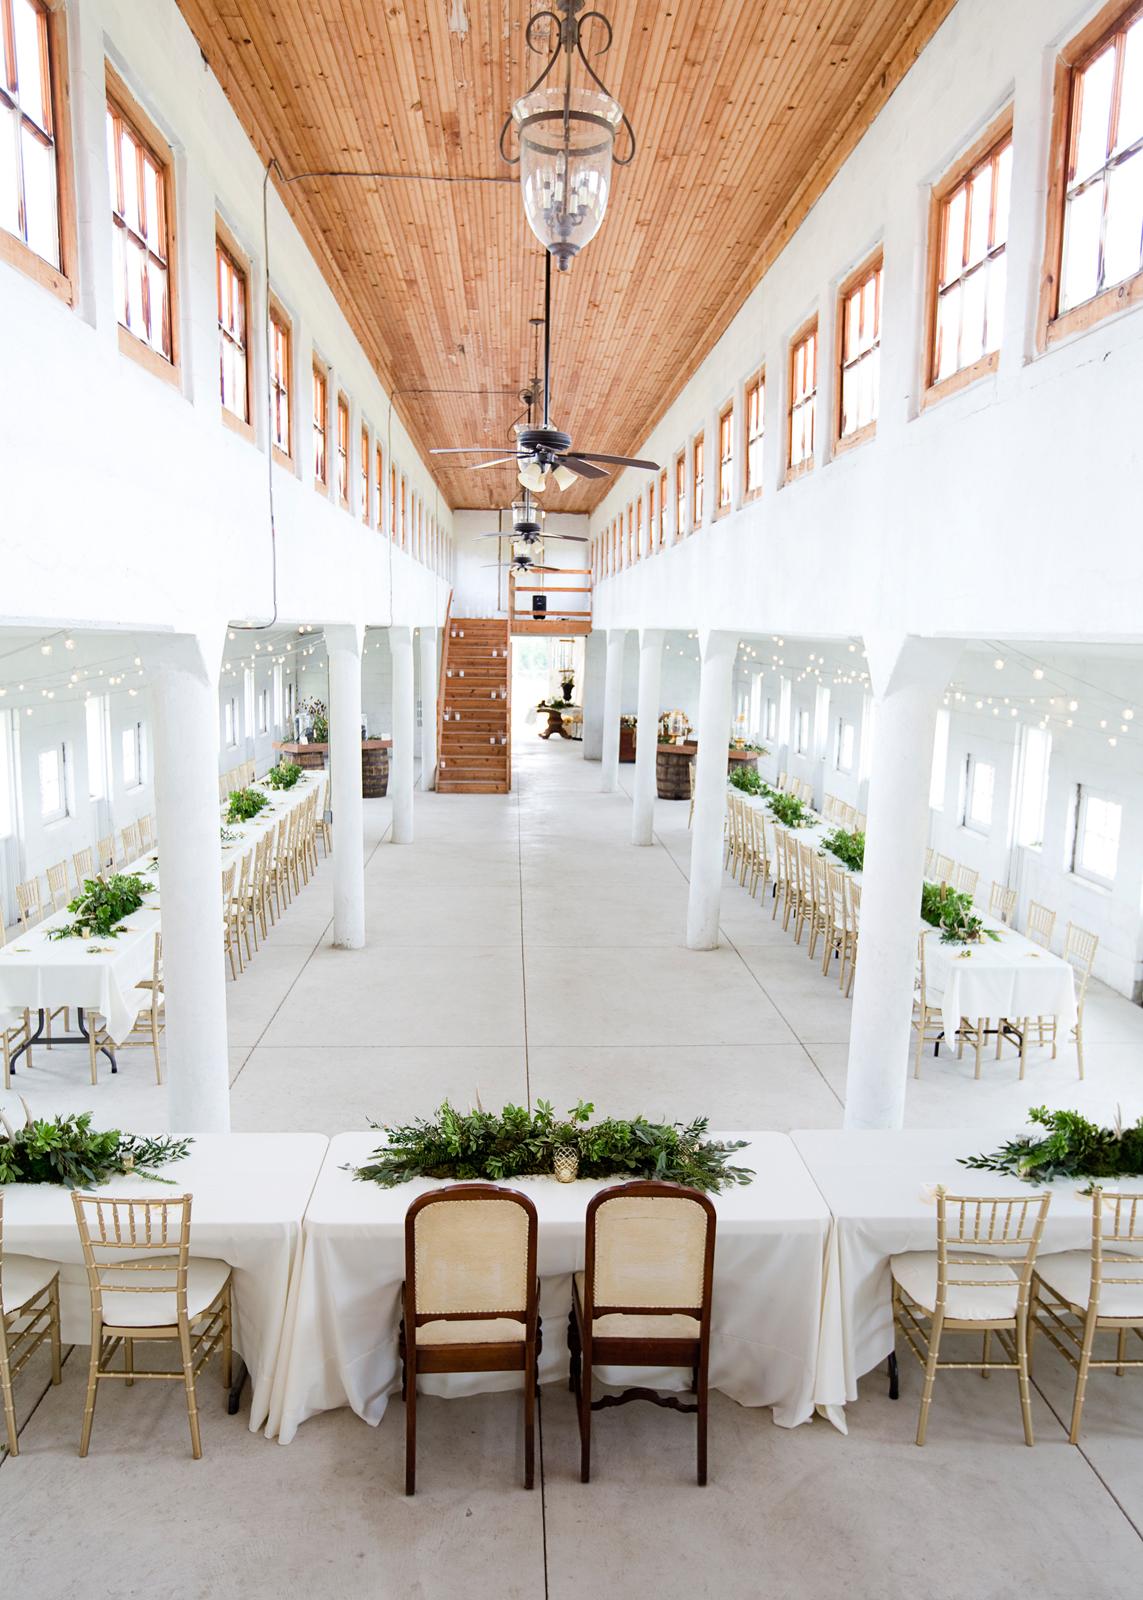 Northeast Ohio Rustic Barn Wedding Venues - LIGHTBULB EVENTS